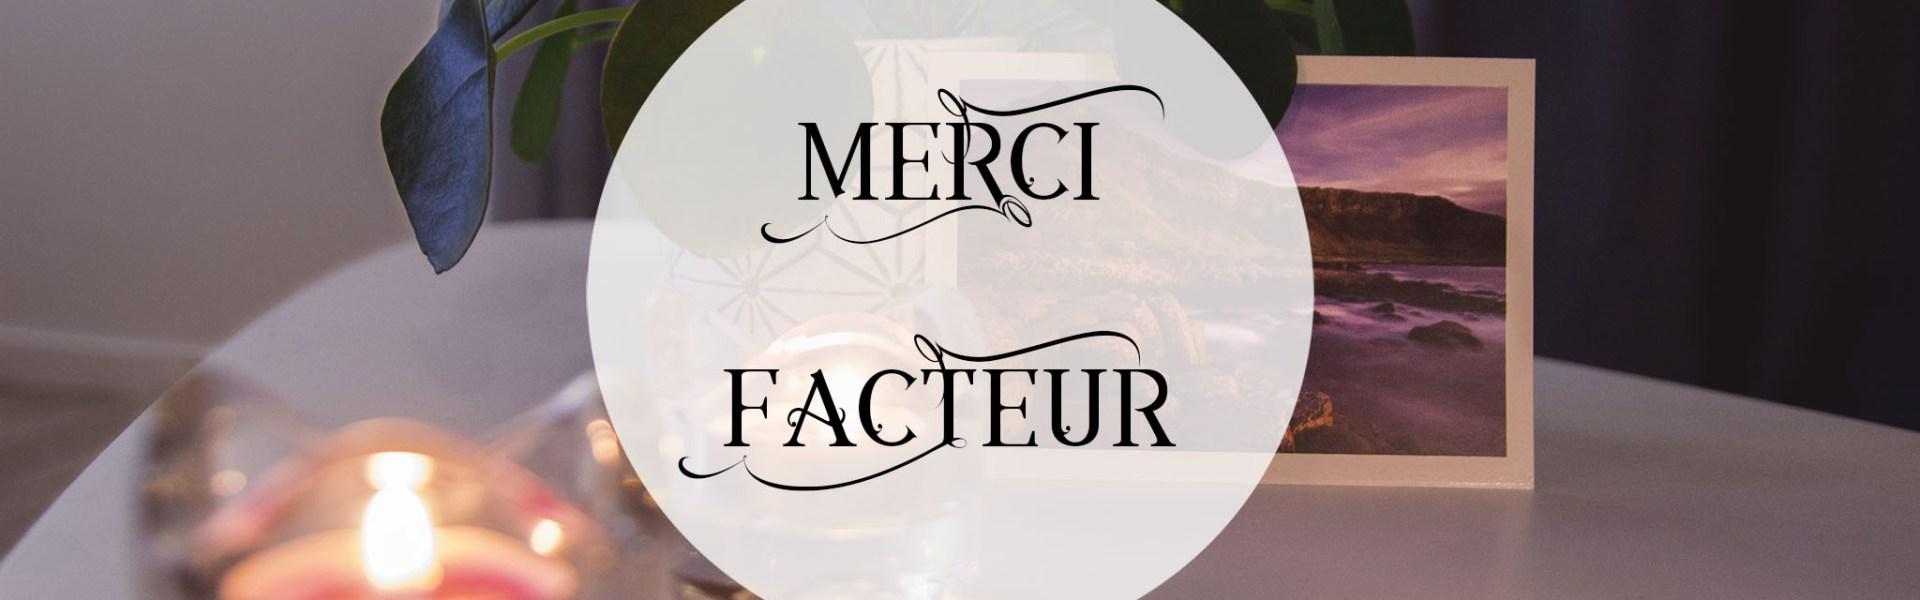 Merci Facteur